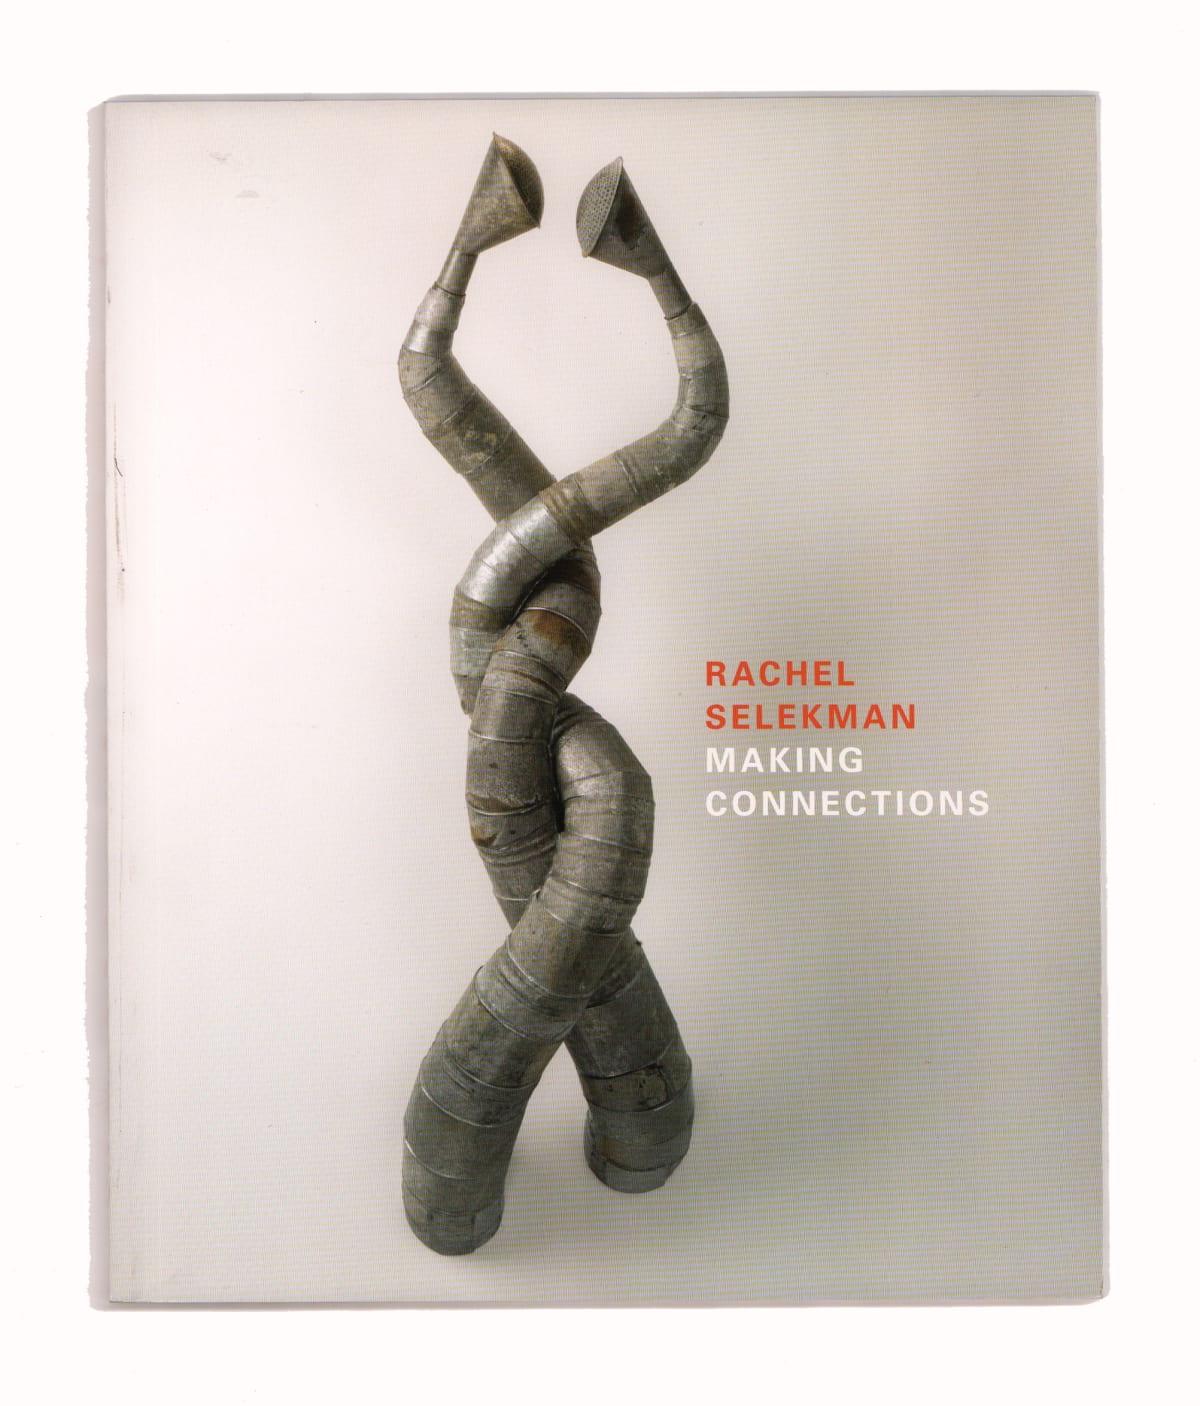 Rachel Selekman